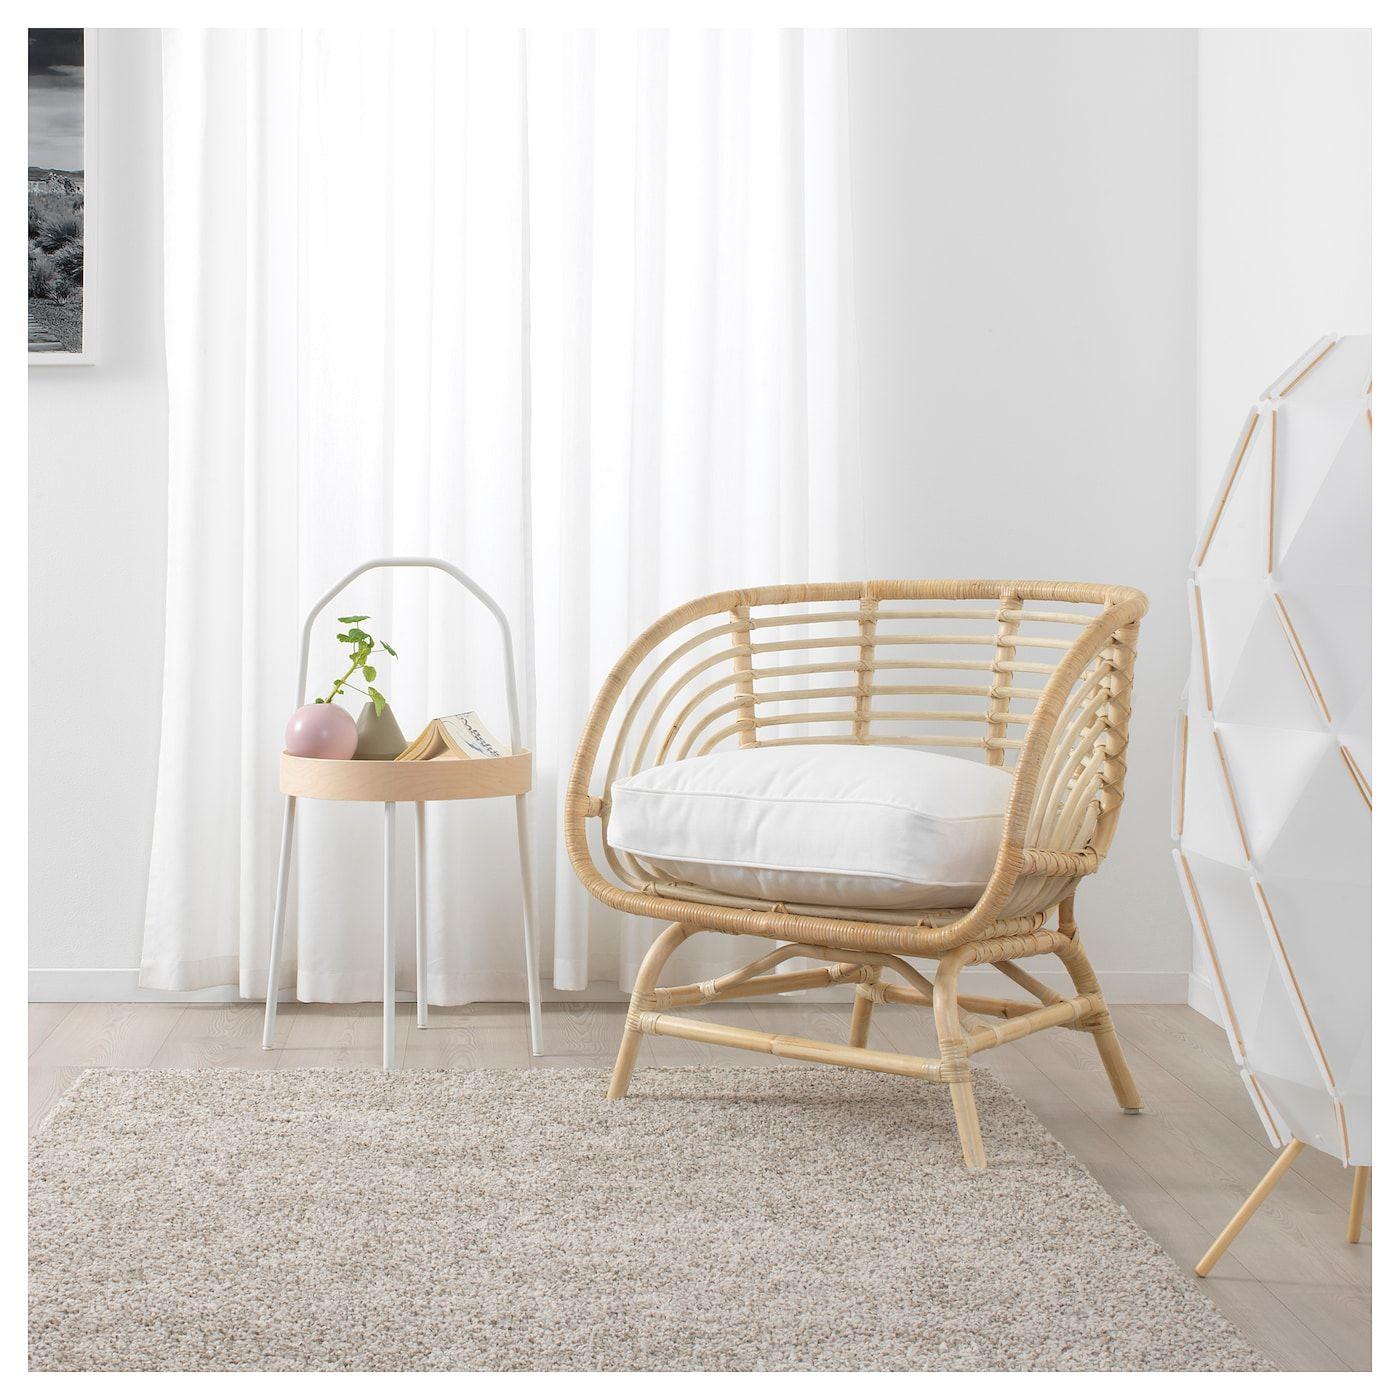 Cuscino Alla Francese Ikea buskbo poltrona - rattan | idee ikea, malacca, ikea